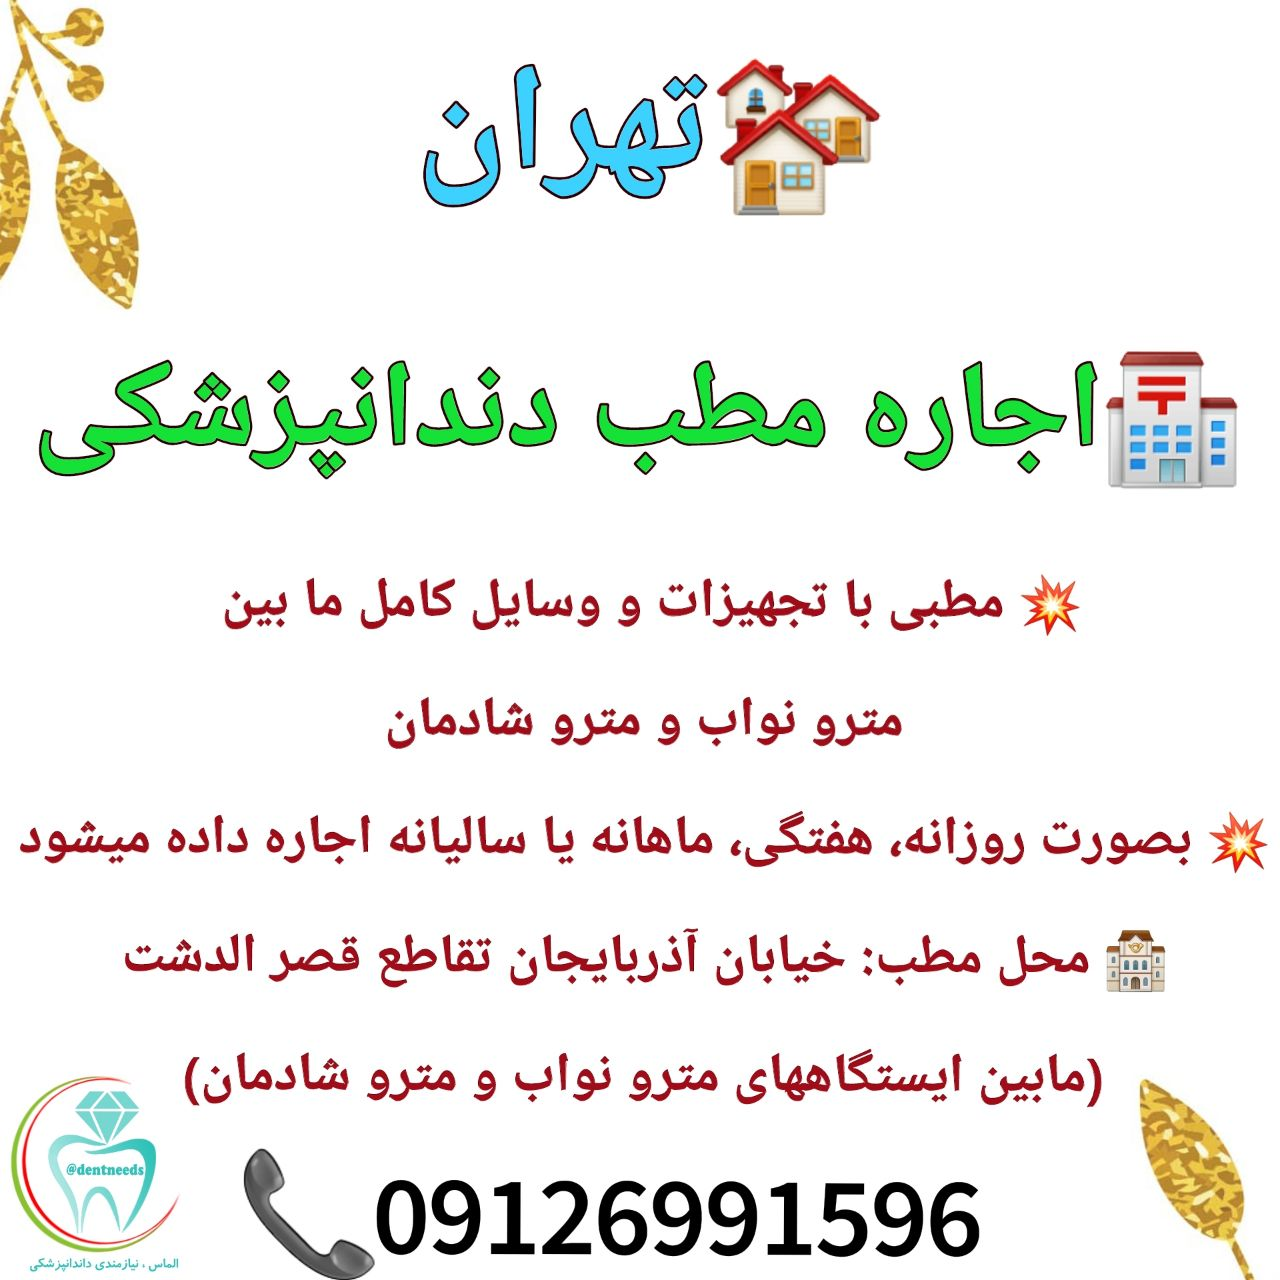 تهران: اجاره مطب دندانپزشکی